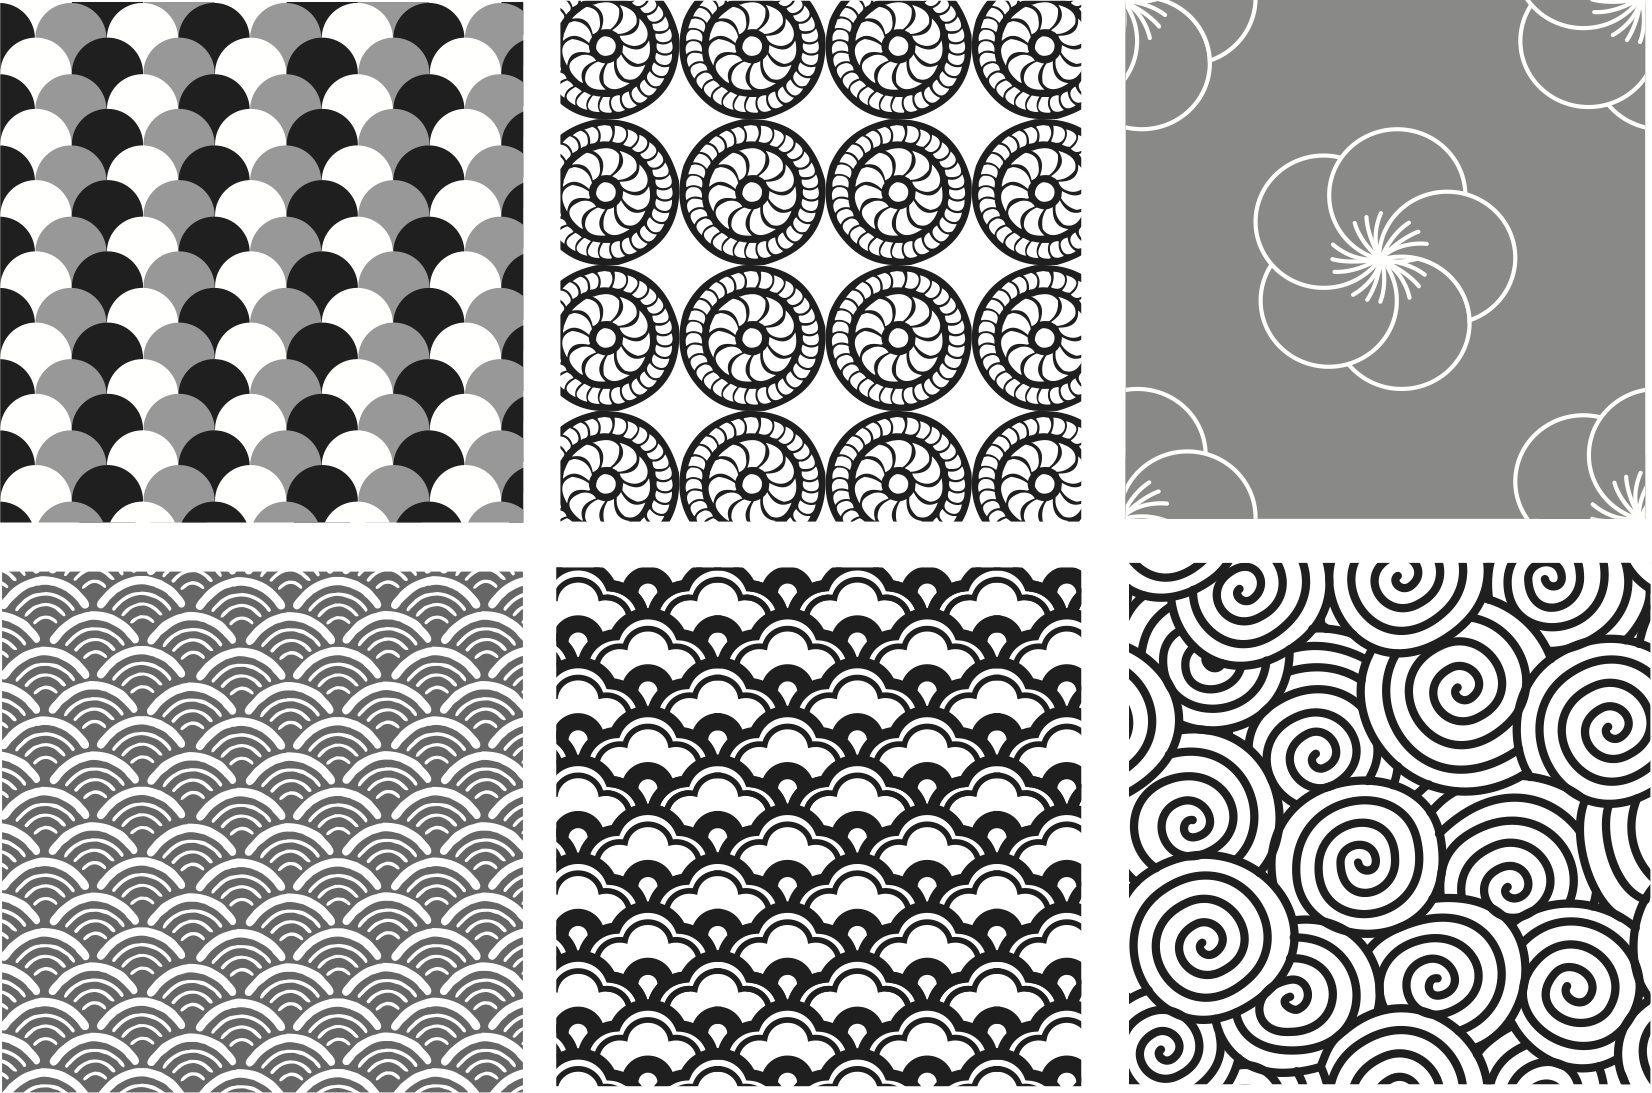 Geometric Patterns | Wallpaper modern geometric patterns ... - photo#40